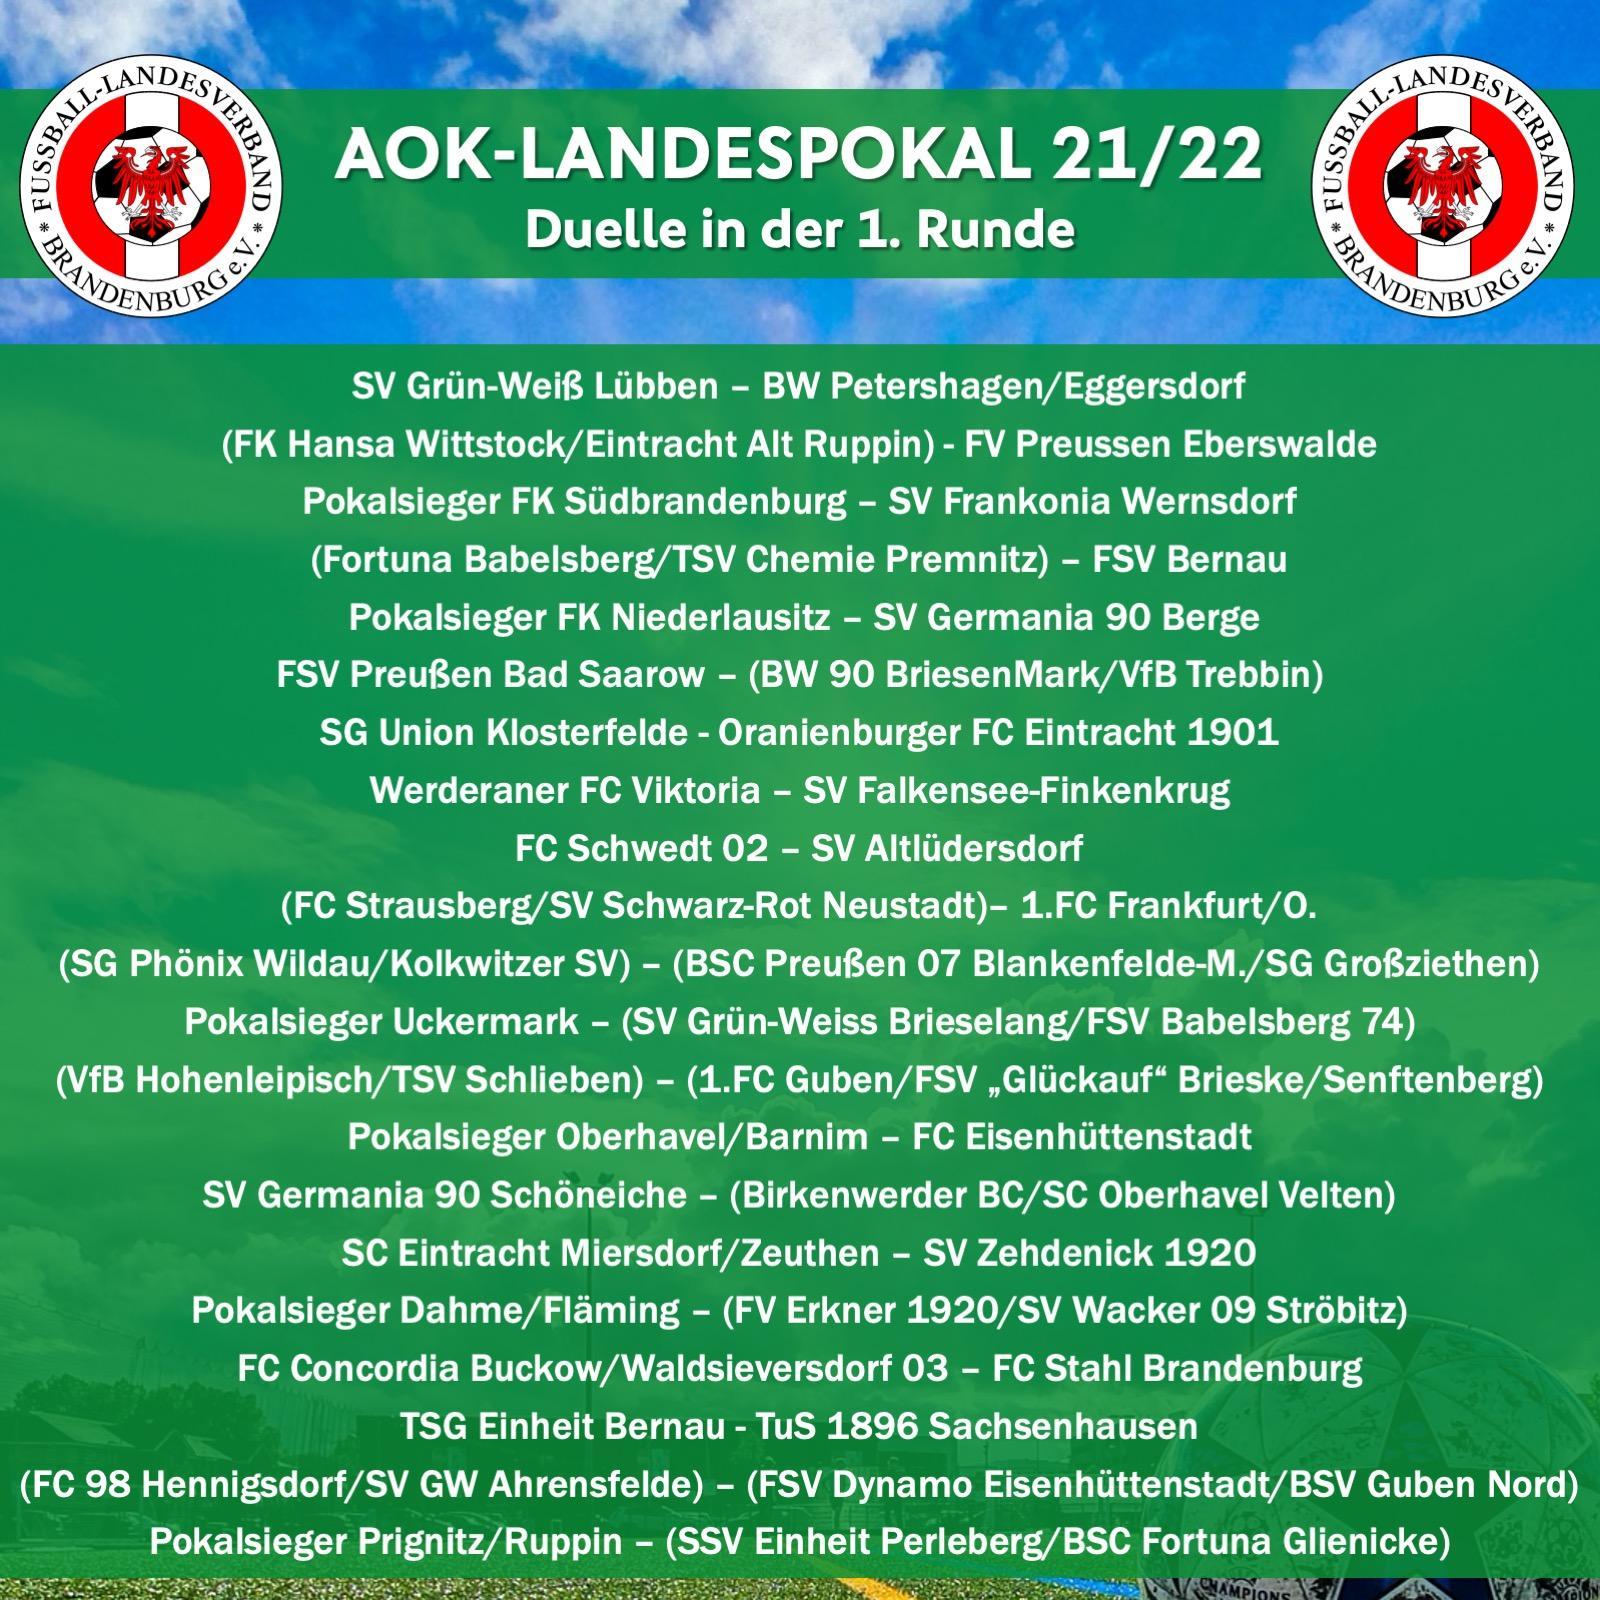 1.Runde im AOK-Landespokal 2021/22